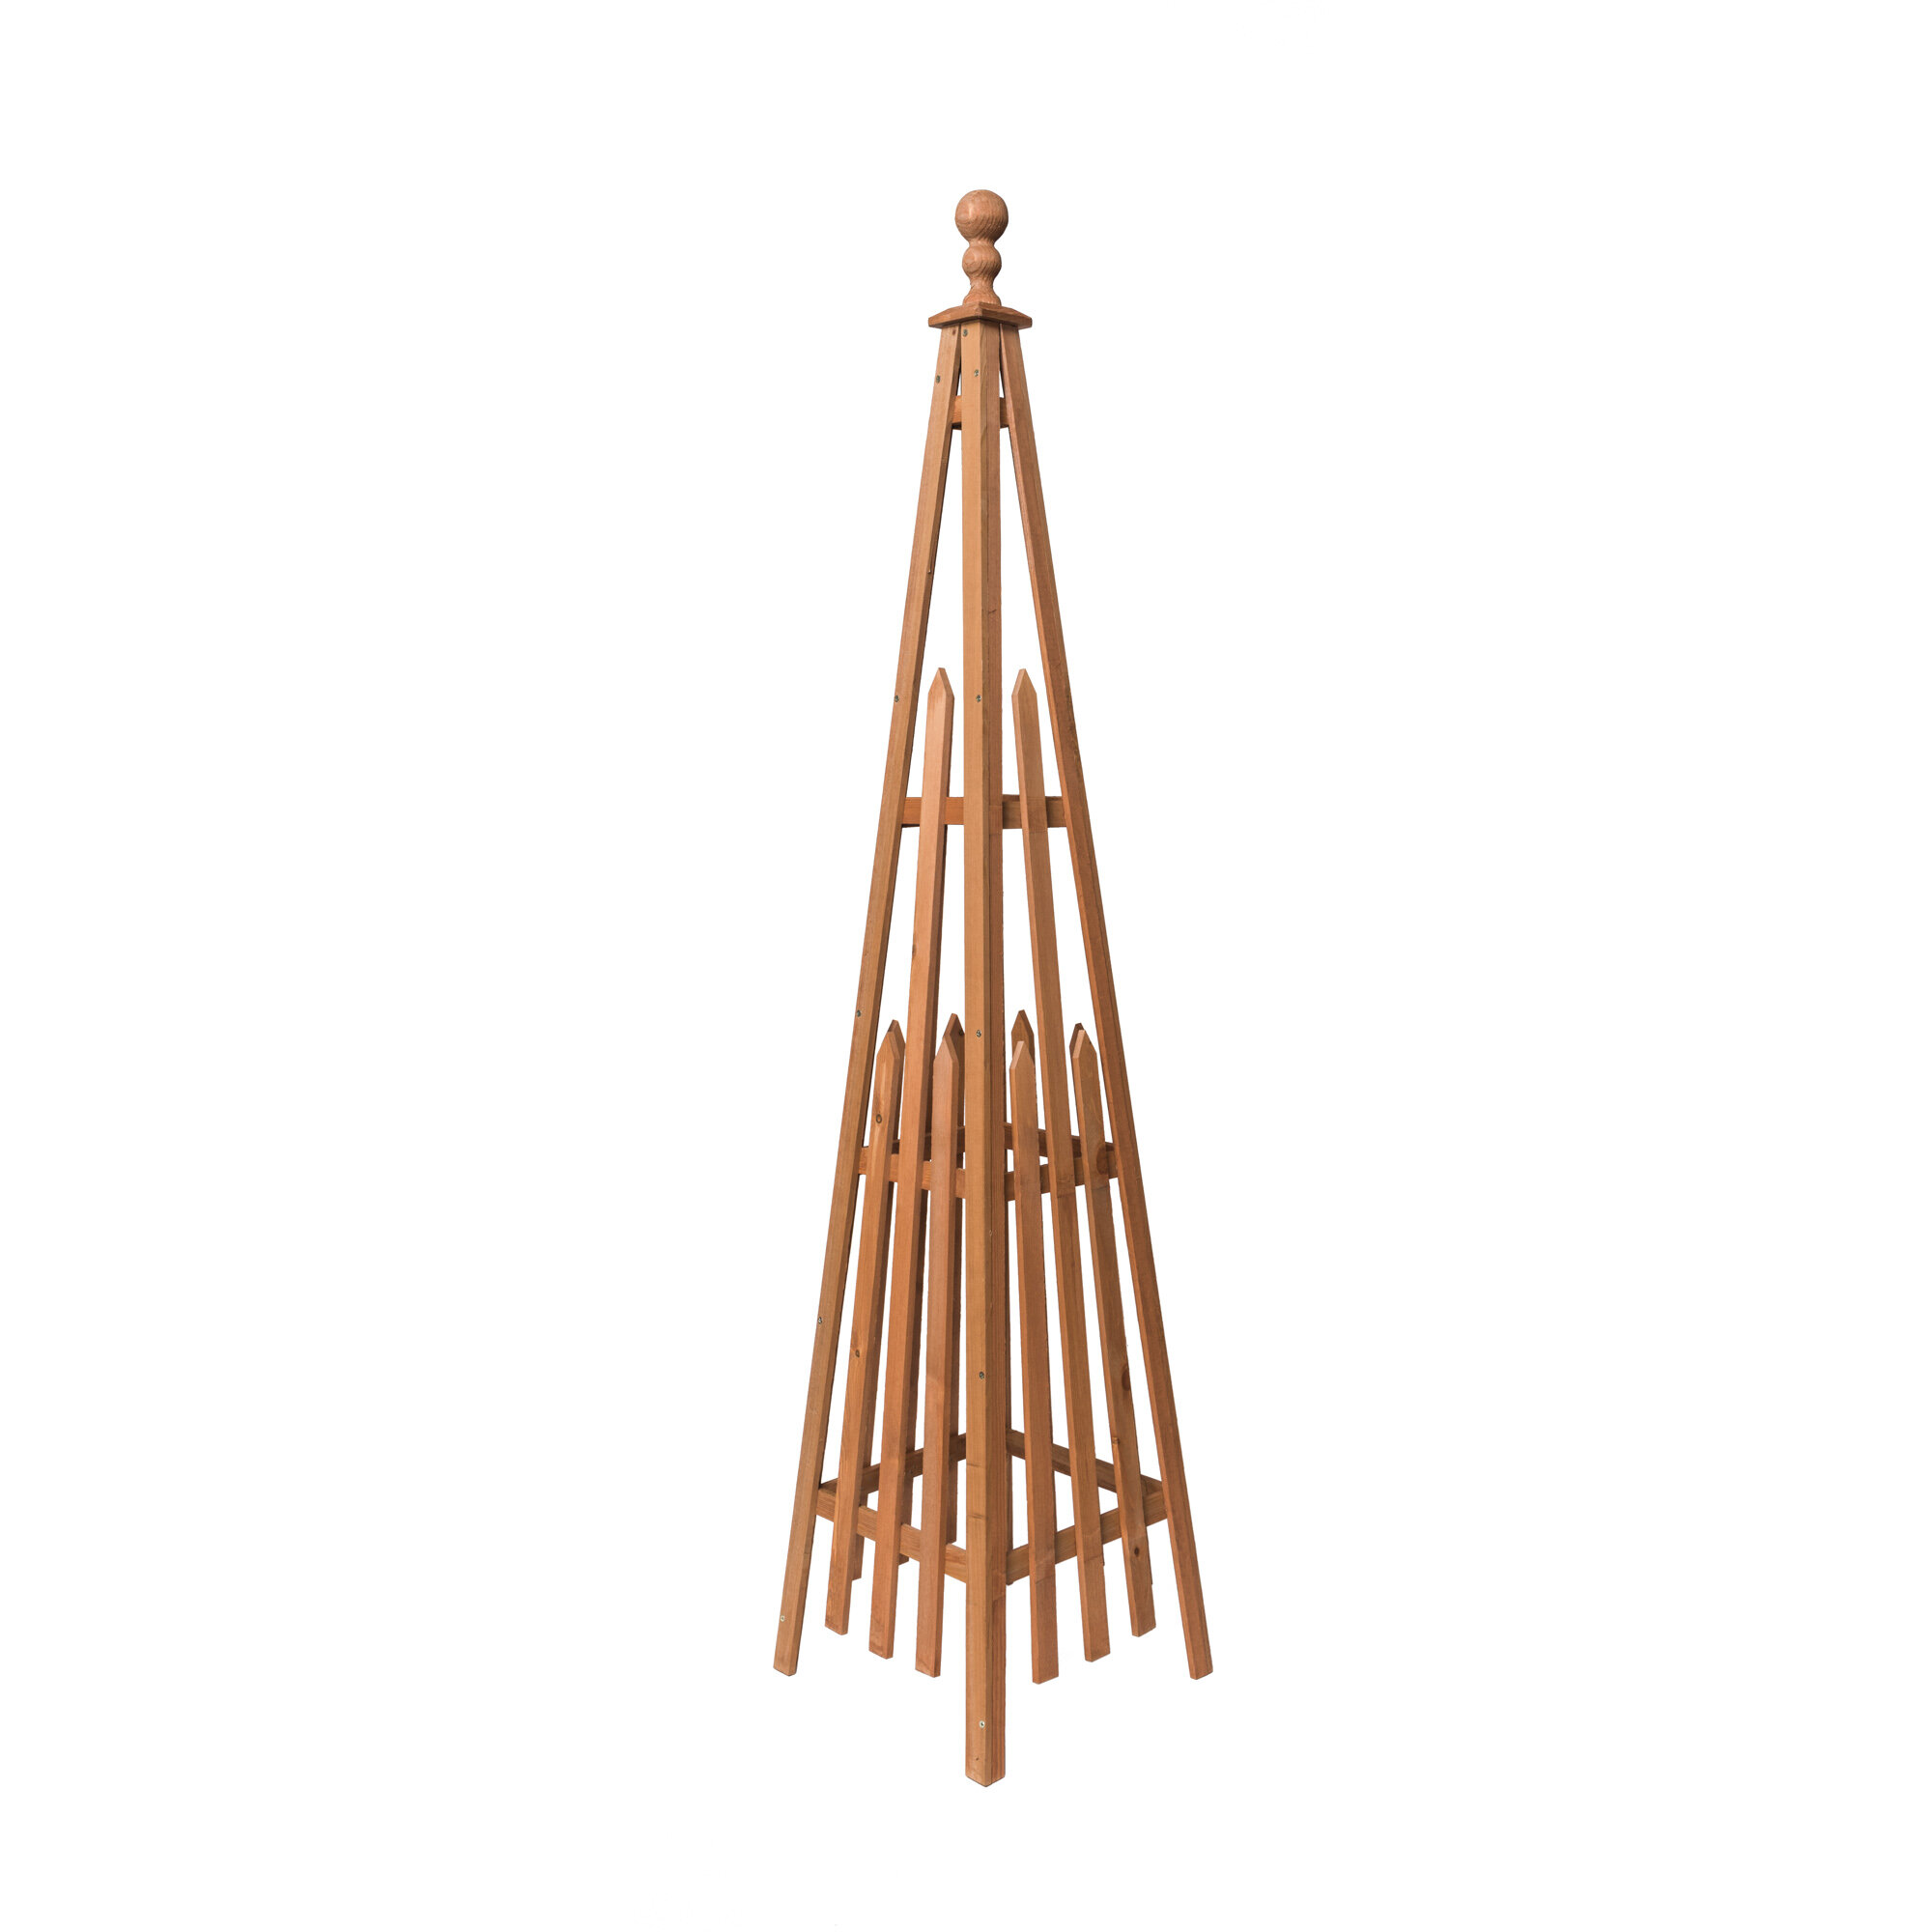 Flamino Wood Obelisk Trellis